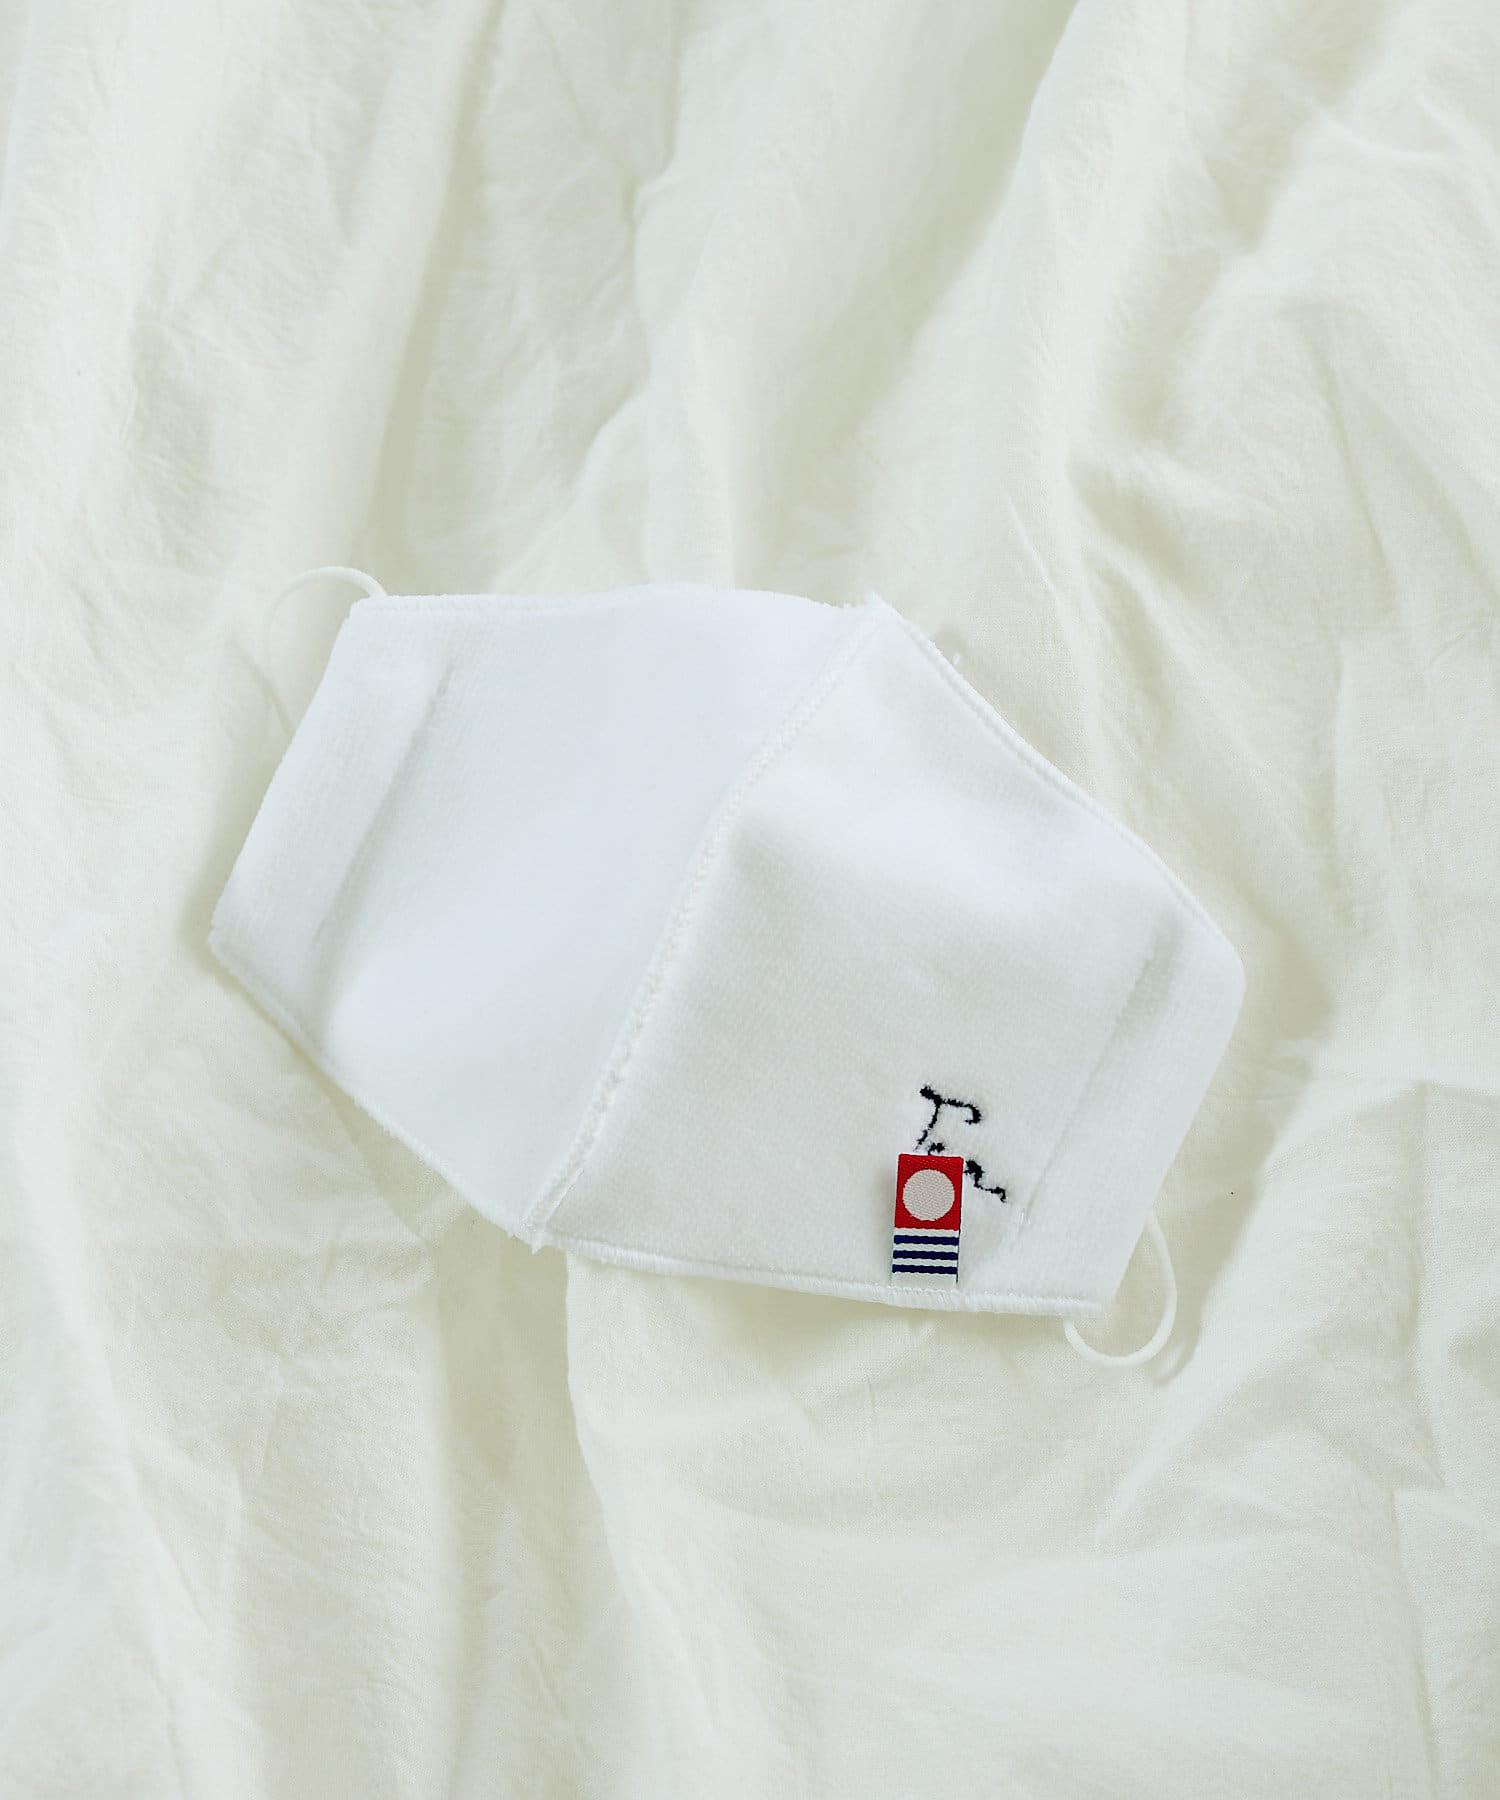 TERRITOIRE(テリトワール) 【ころんと形がかわいい】今治ふんわりタオルマスク